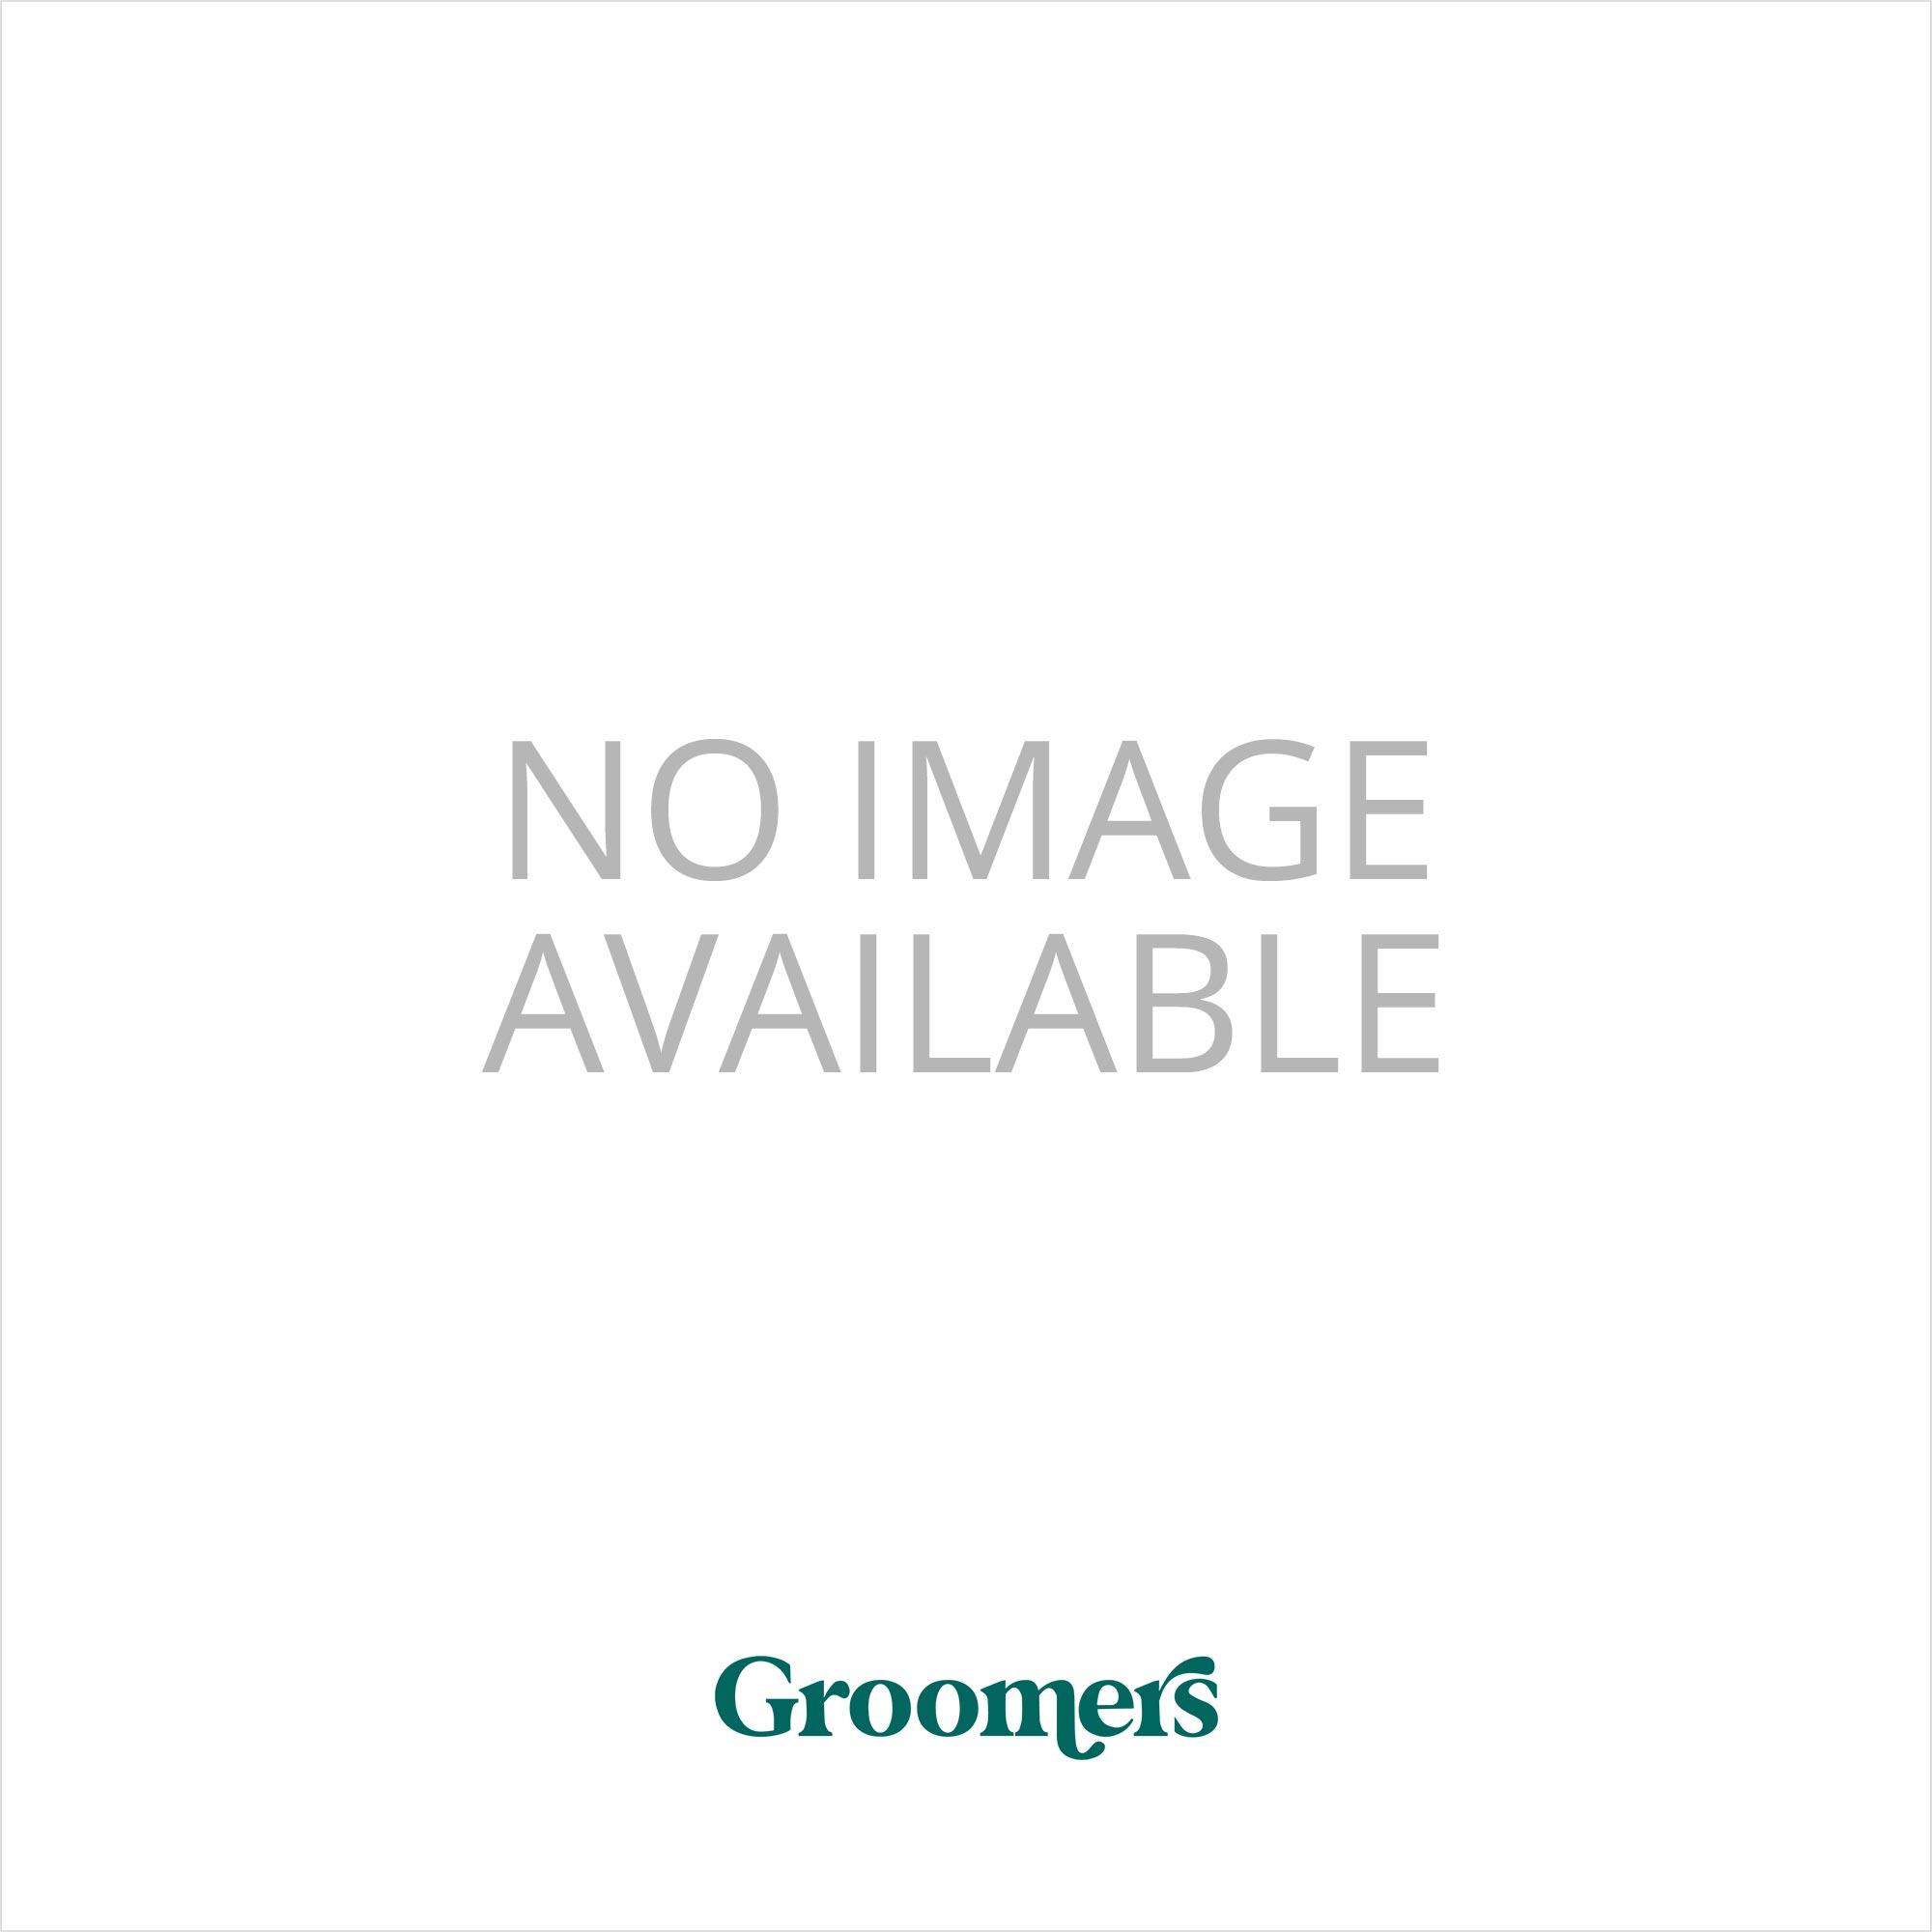 GroomX 20 Scissor Case - Black